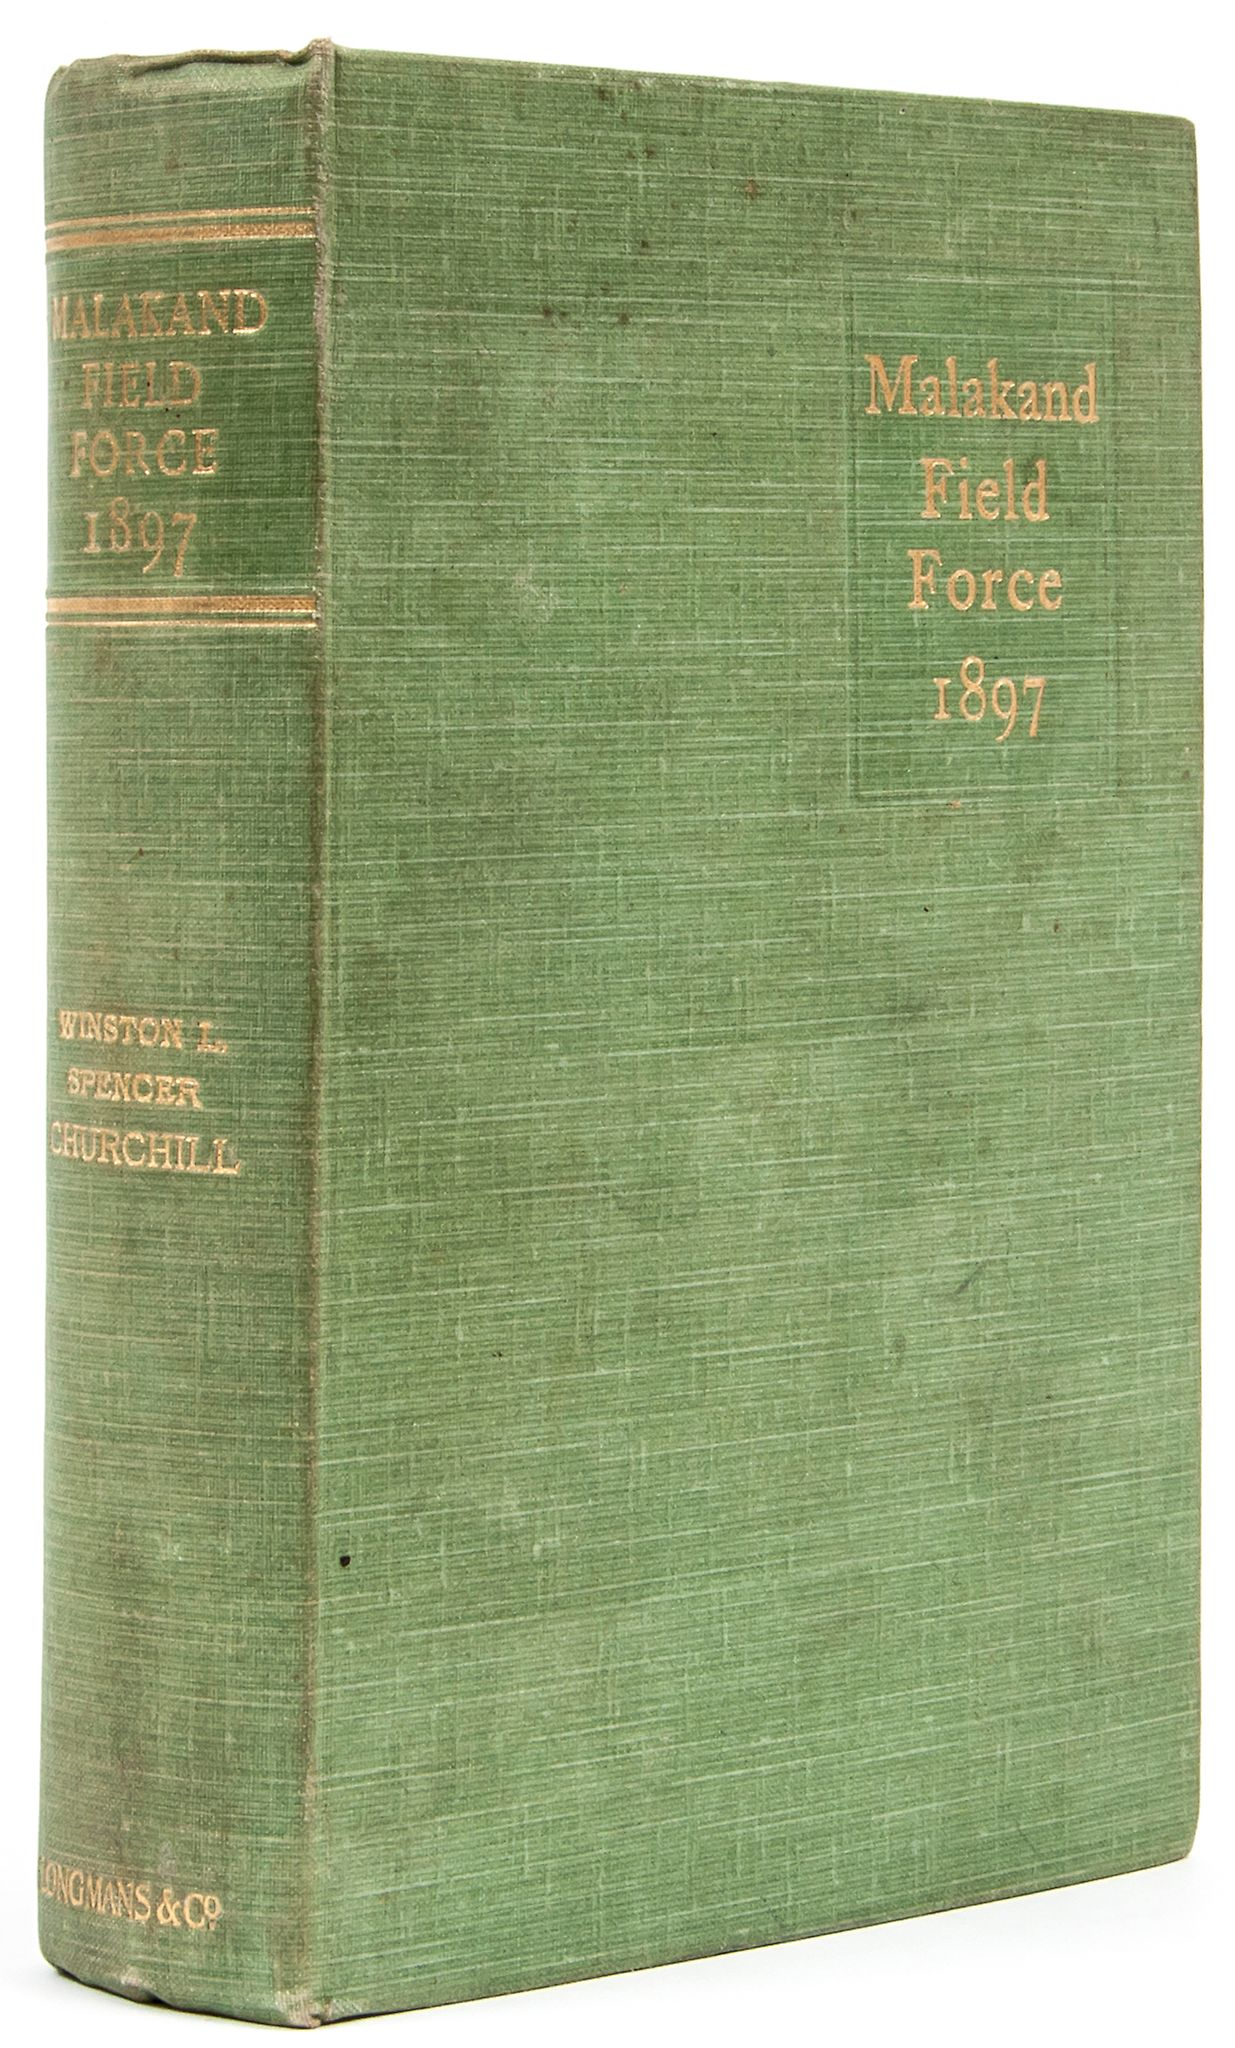 malakand field force first edition.jpg